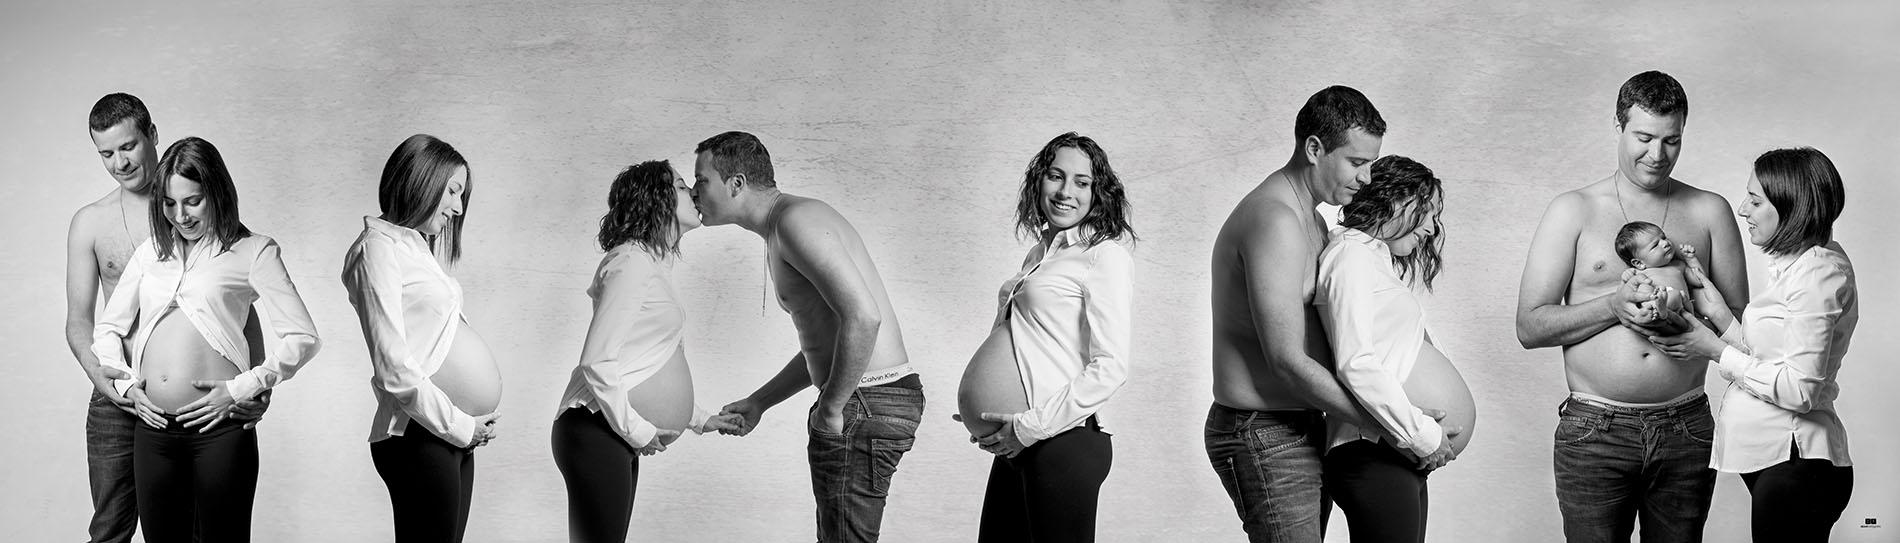 seguimiento-embarazo-foto-fotografia-asturias-embarazada